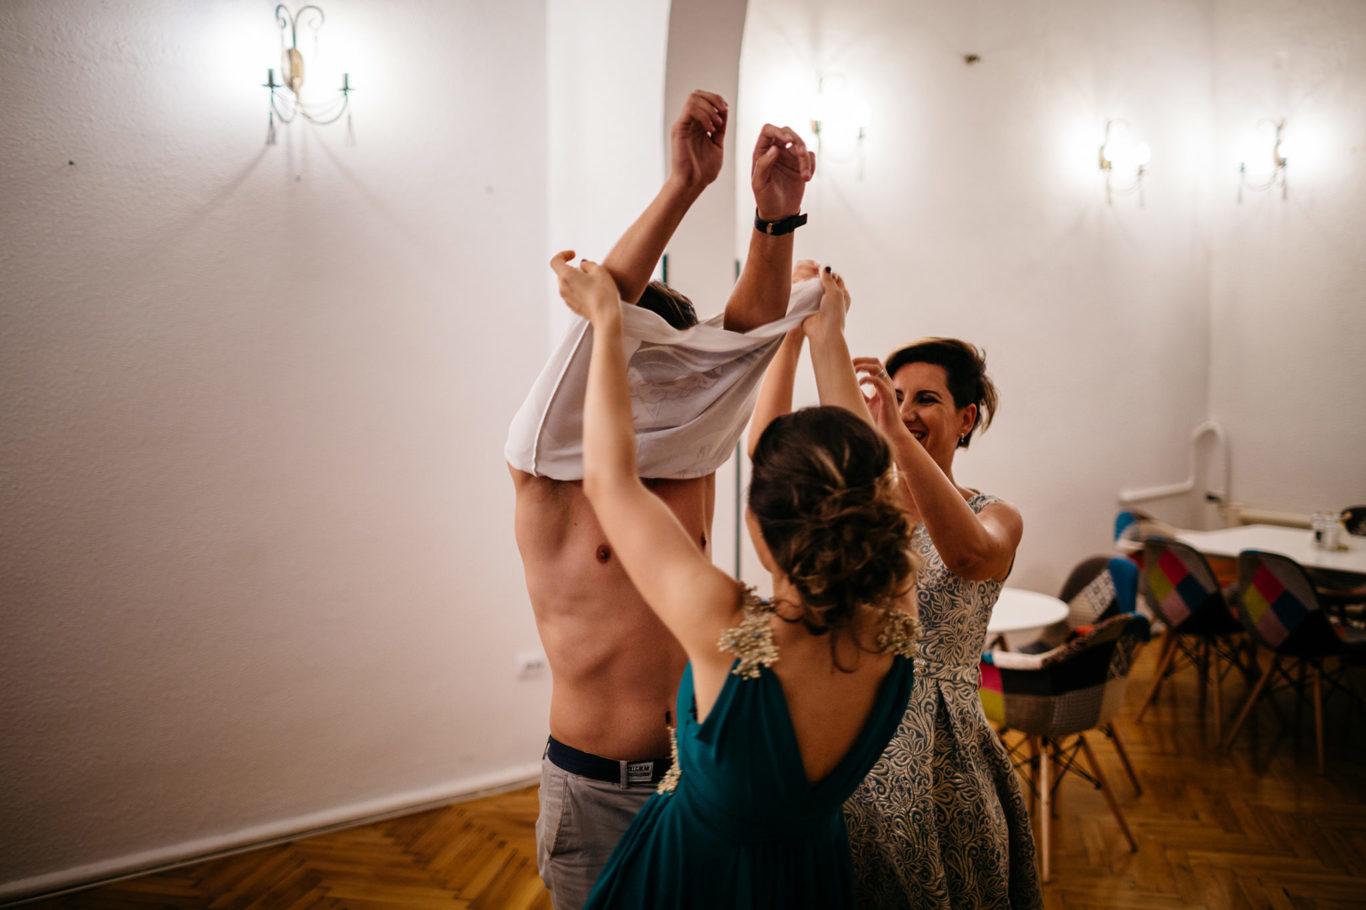 0722-fotografie-nunta-bucuresti-anca-george-fotograf-ciprian-dumitrescu-dcf_6166